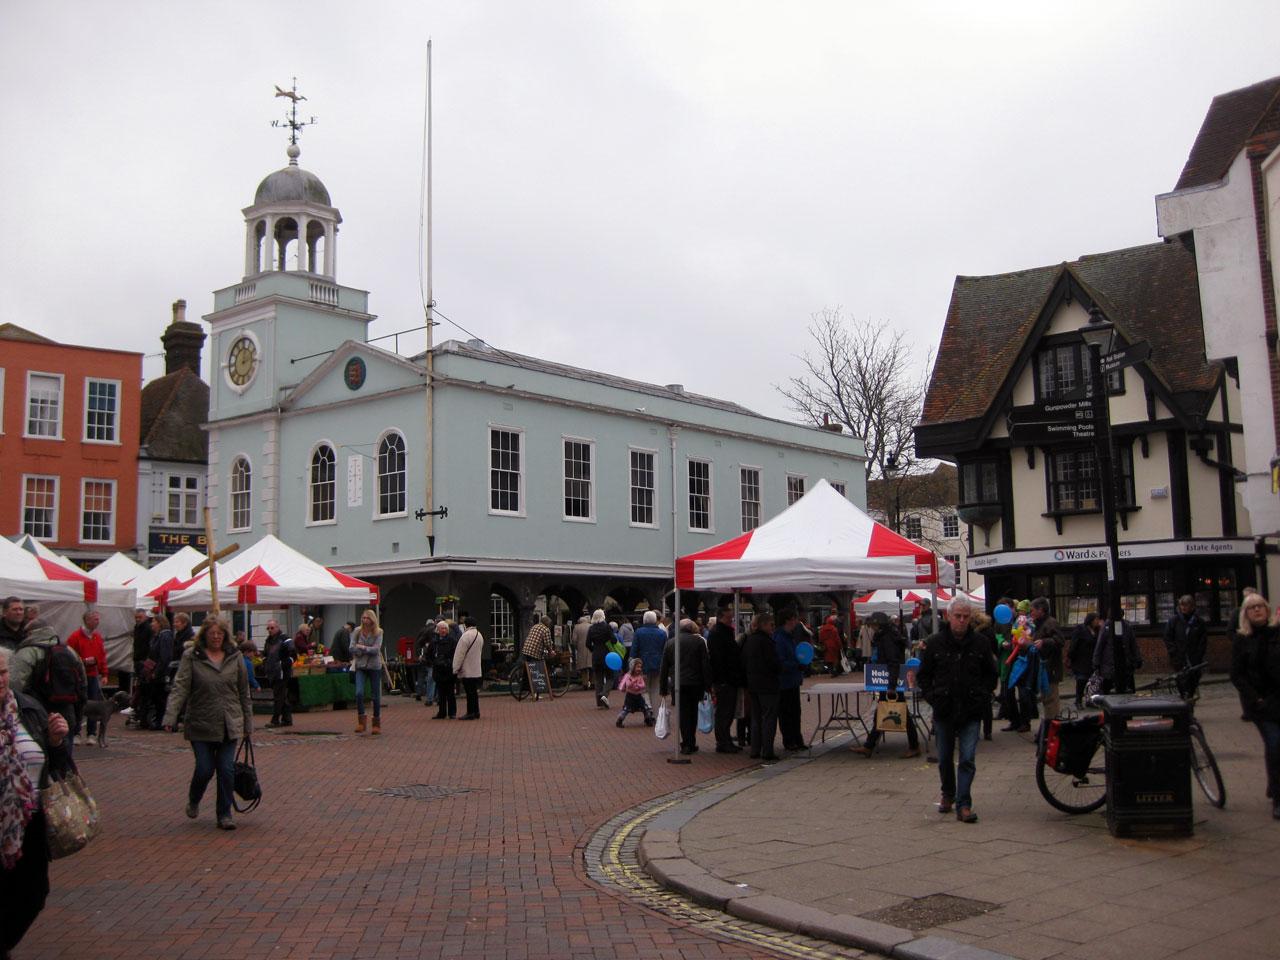 Faversham market, Kent